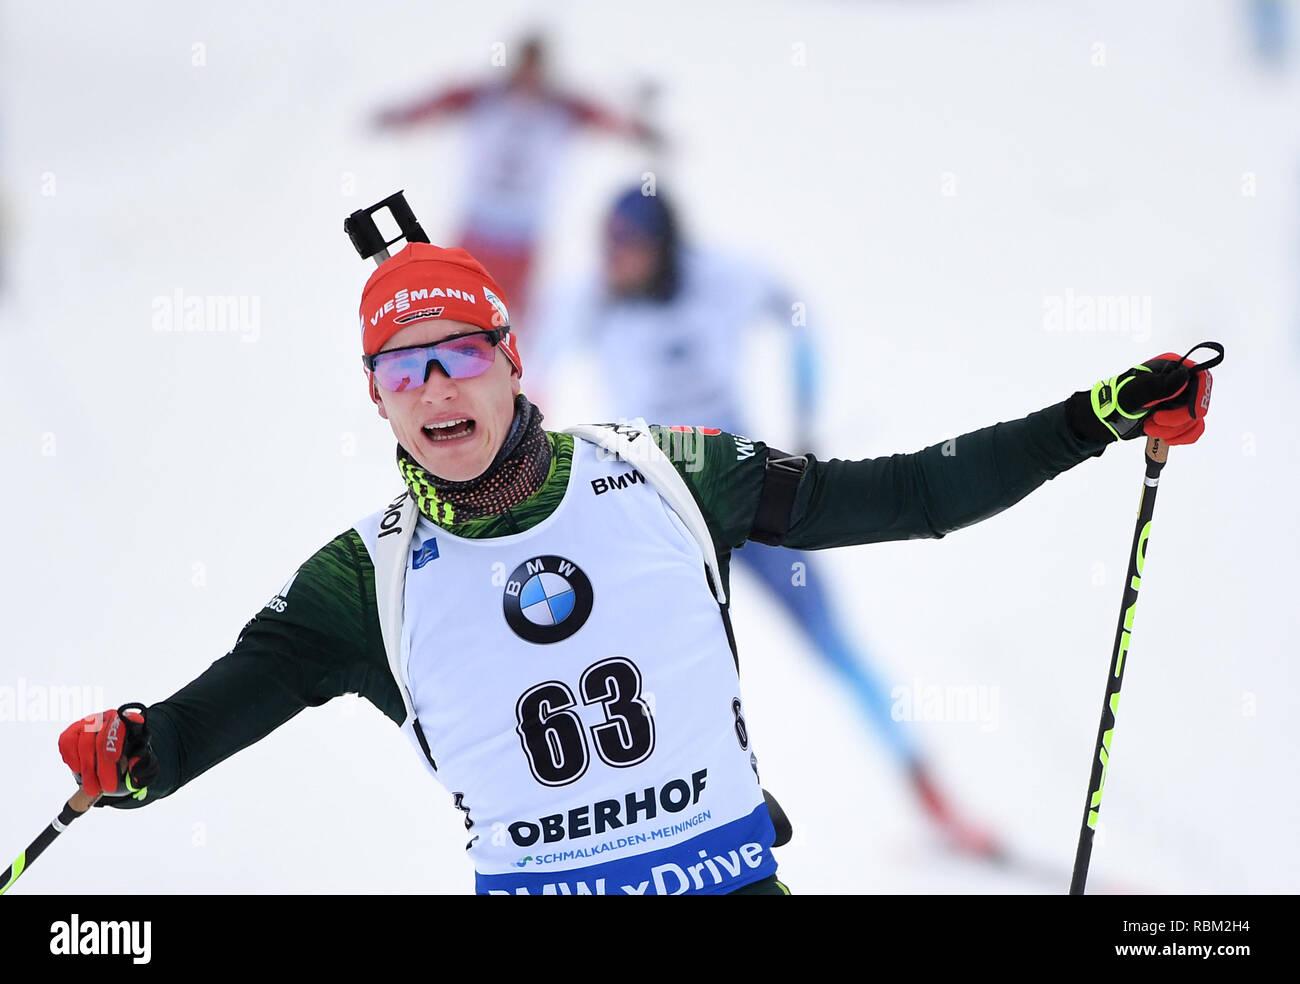 Oberhof, Germany. 11th Jan, 2019. Biathlon, World Cup, Sprint 10 km, Men: Benedikt Doll from Germany on the finish line. He'll be fourth. Credit: Hendrik Schmidt/dpa-Zentralbild/dpa/Alamy Live News Stock Photo